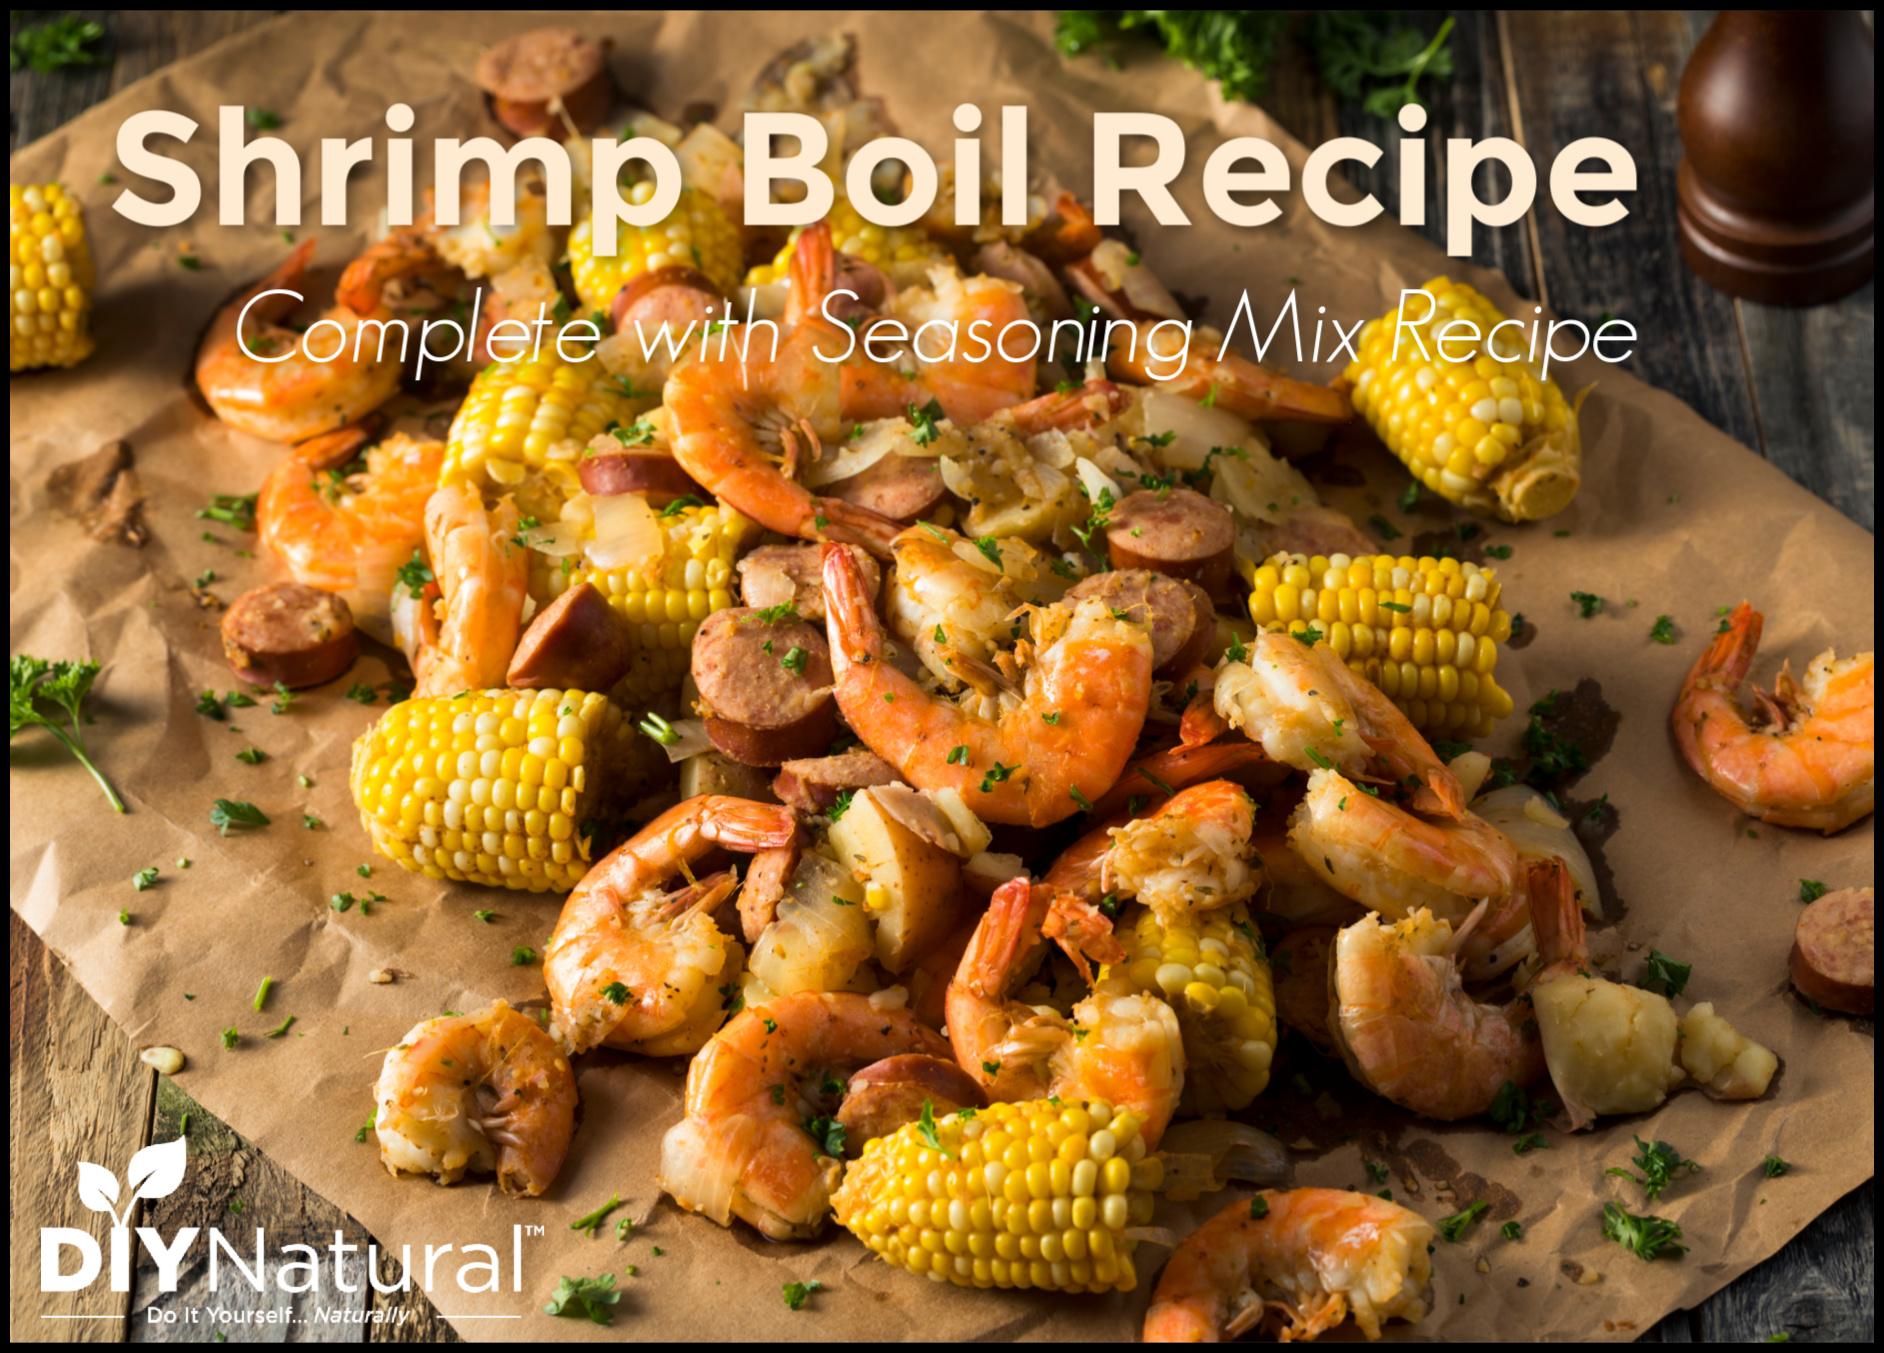 A Shrimp Boil Recipe and Seasoning Mix Recipe